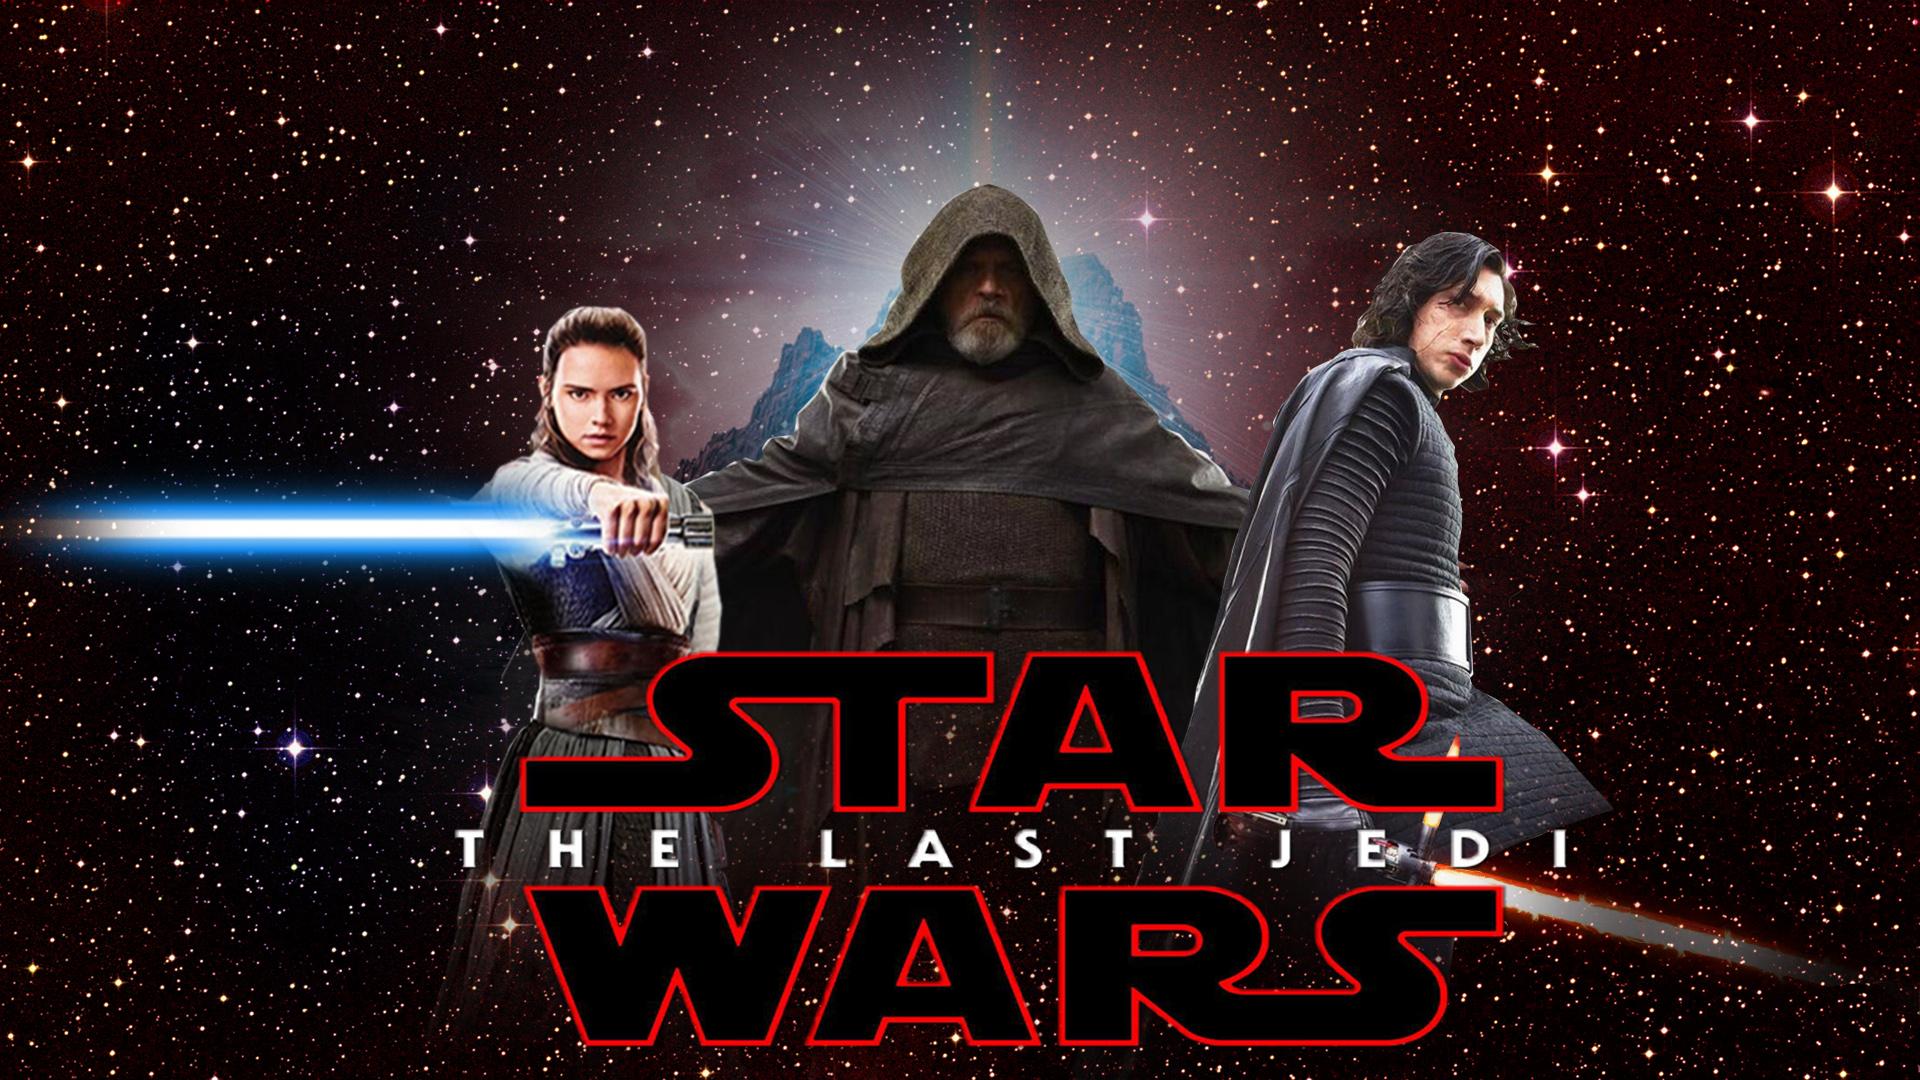 Star wars the last jedi hindi dubbed 2017 torrent - Star wars the last jedi wallpaper ...